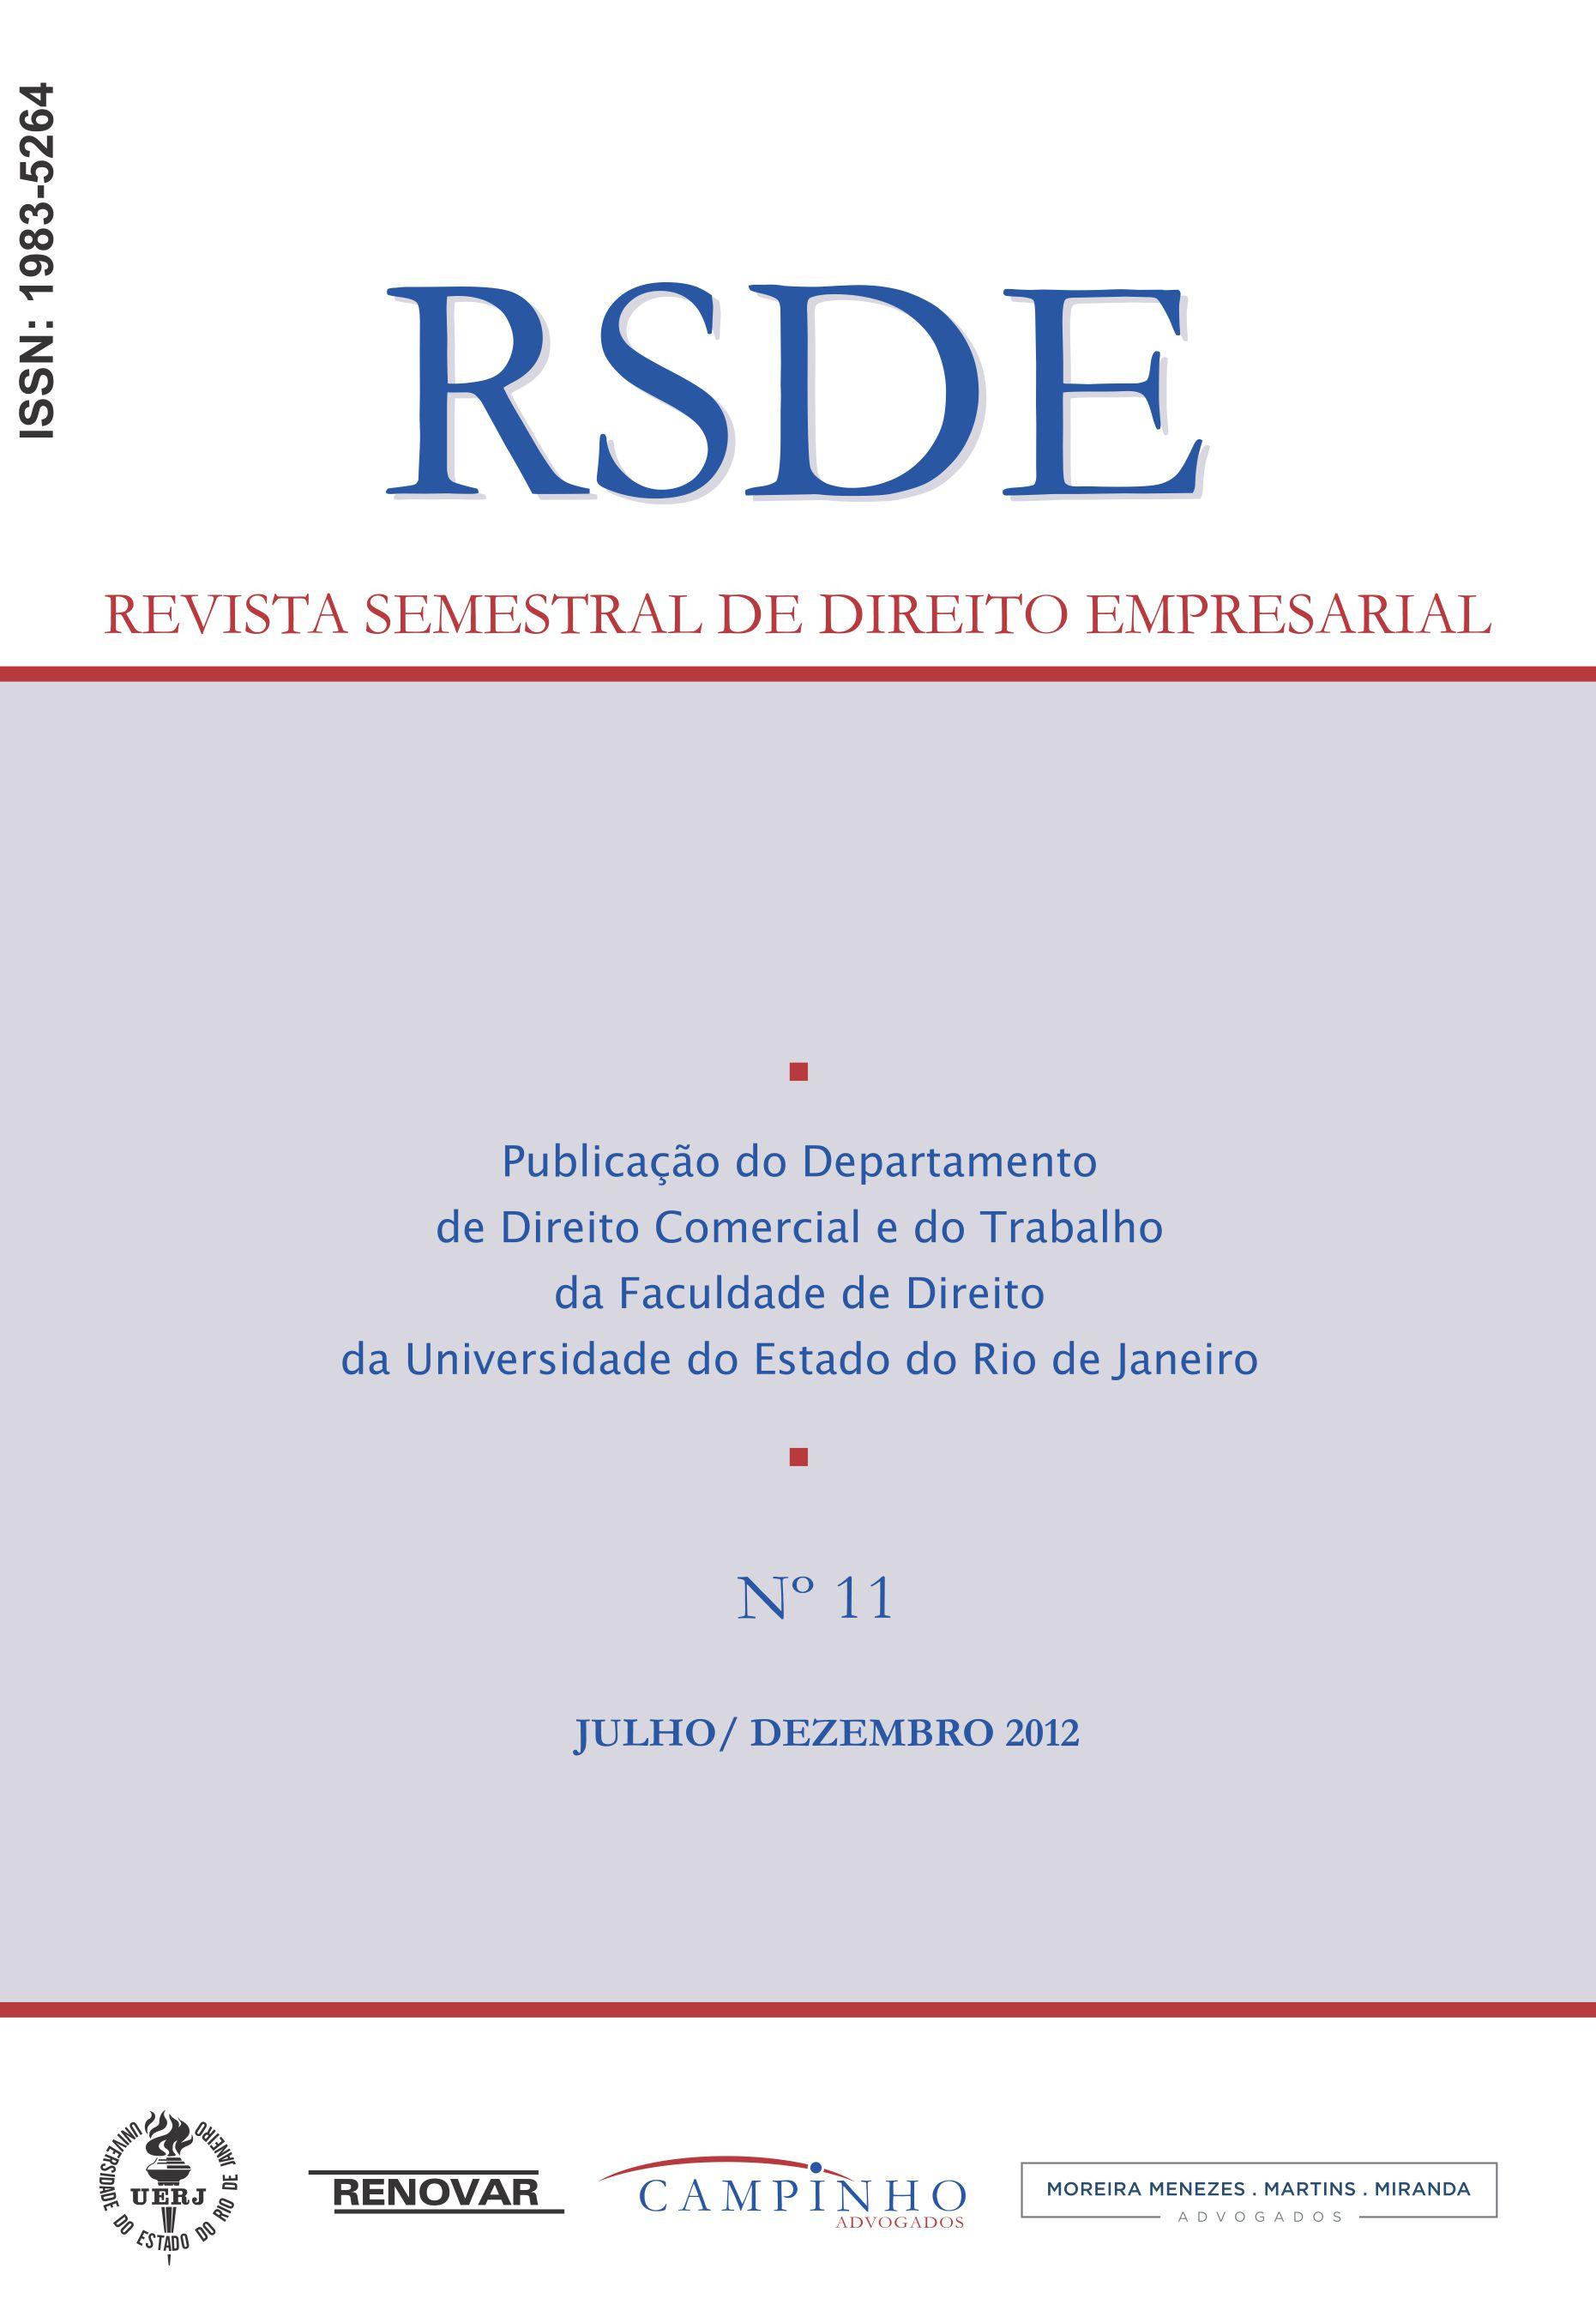 Capa_revista_rsde_11